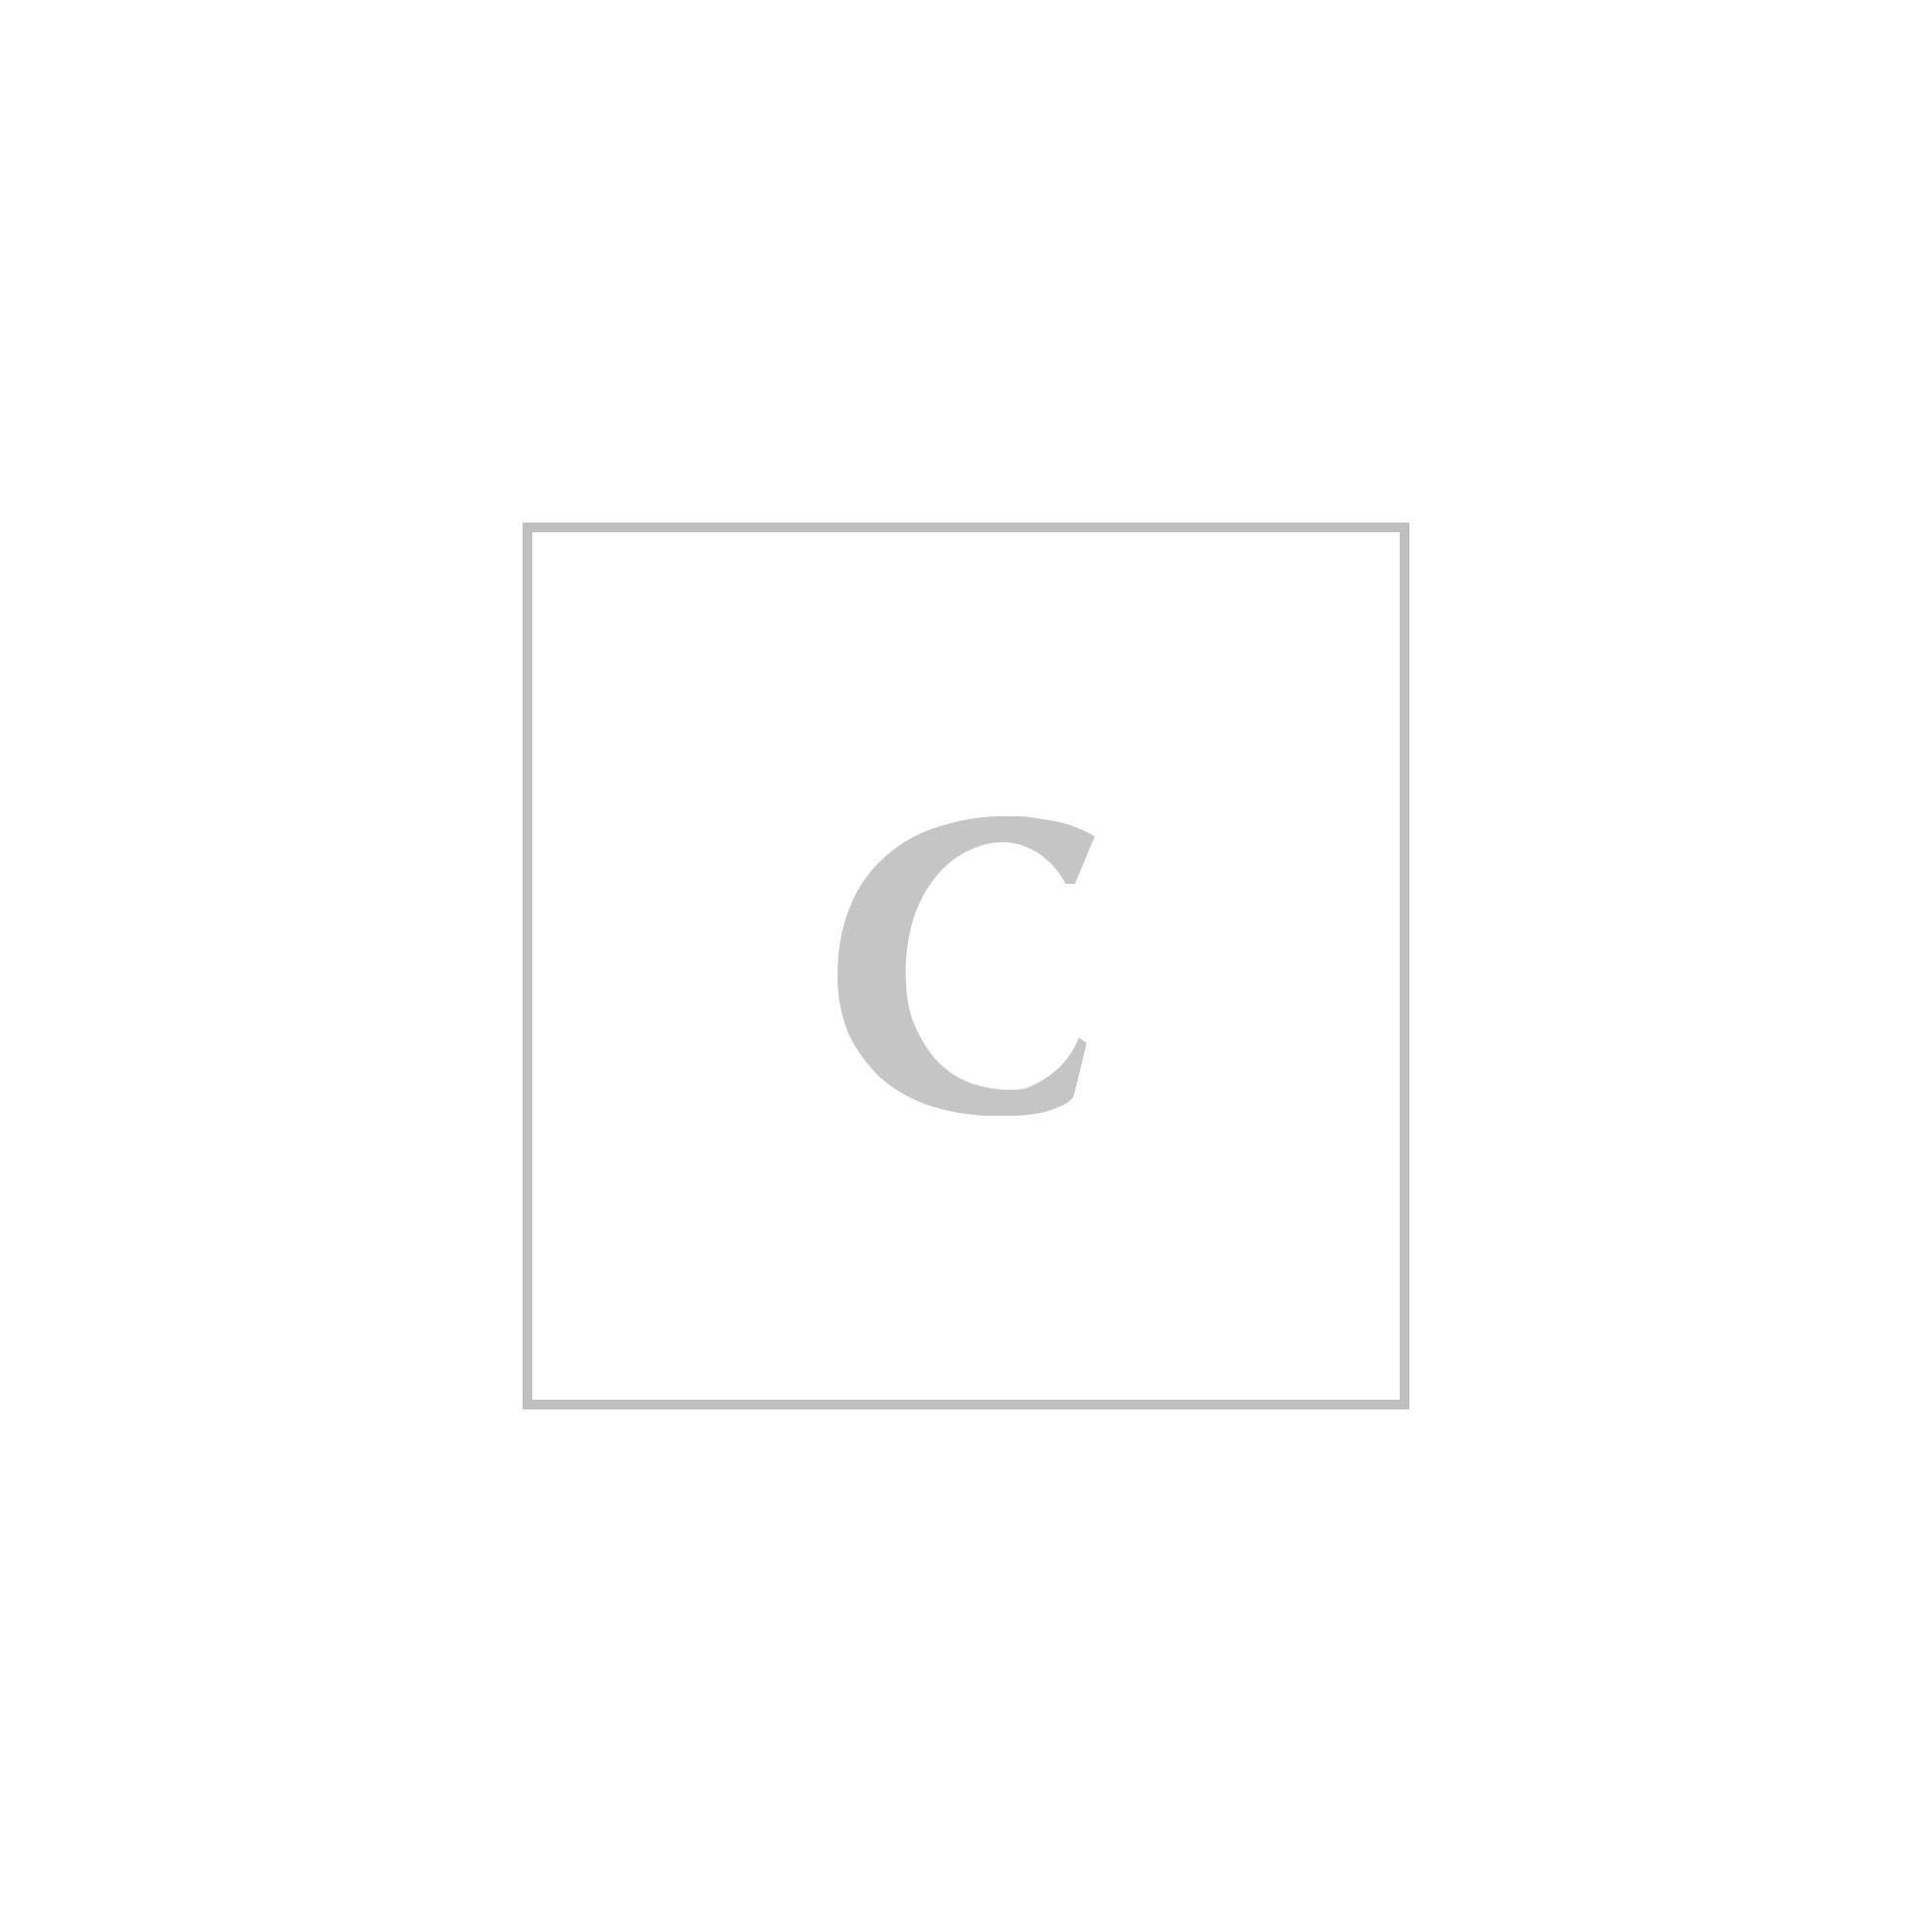 Dolce & gabbana mini bags stampa iguana sicily